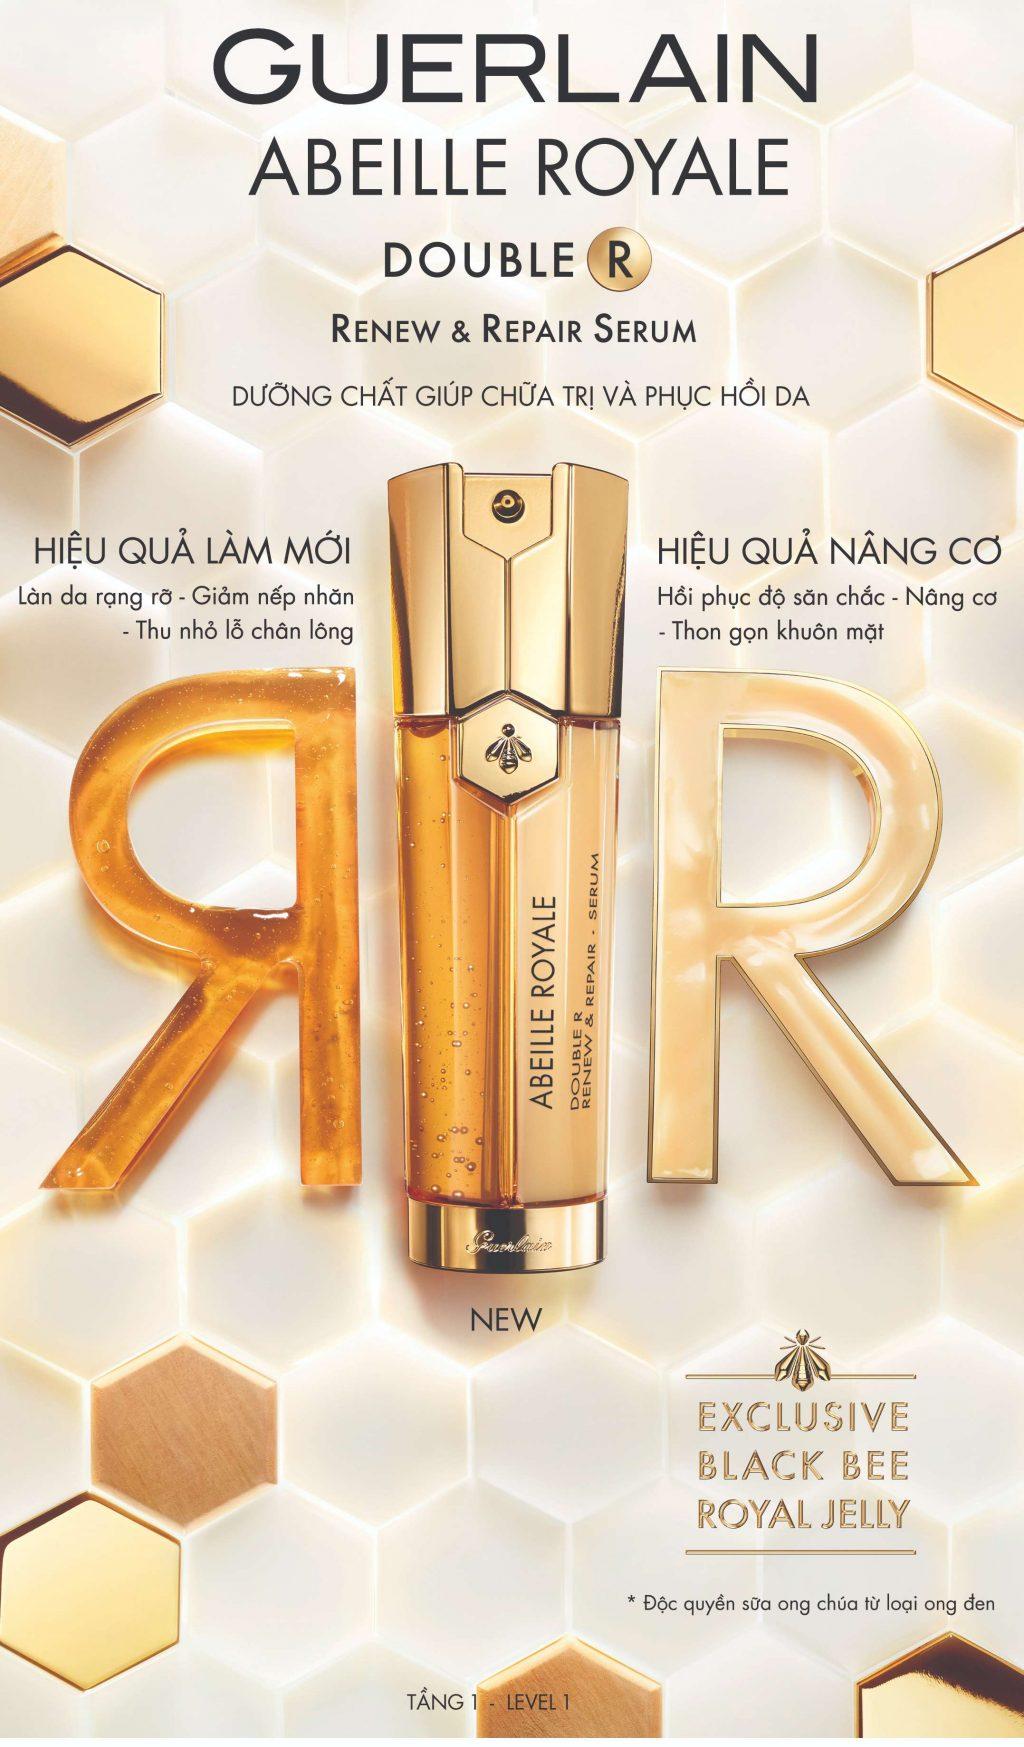 Guerlain ra mắt Double R Serum